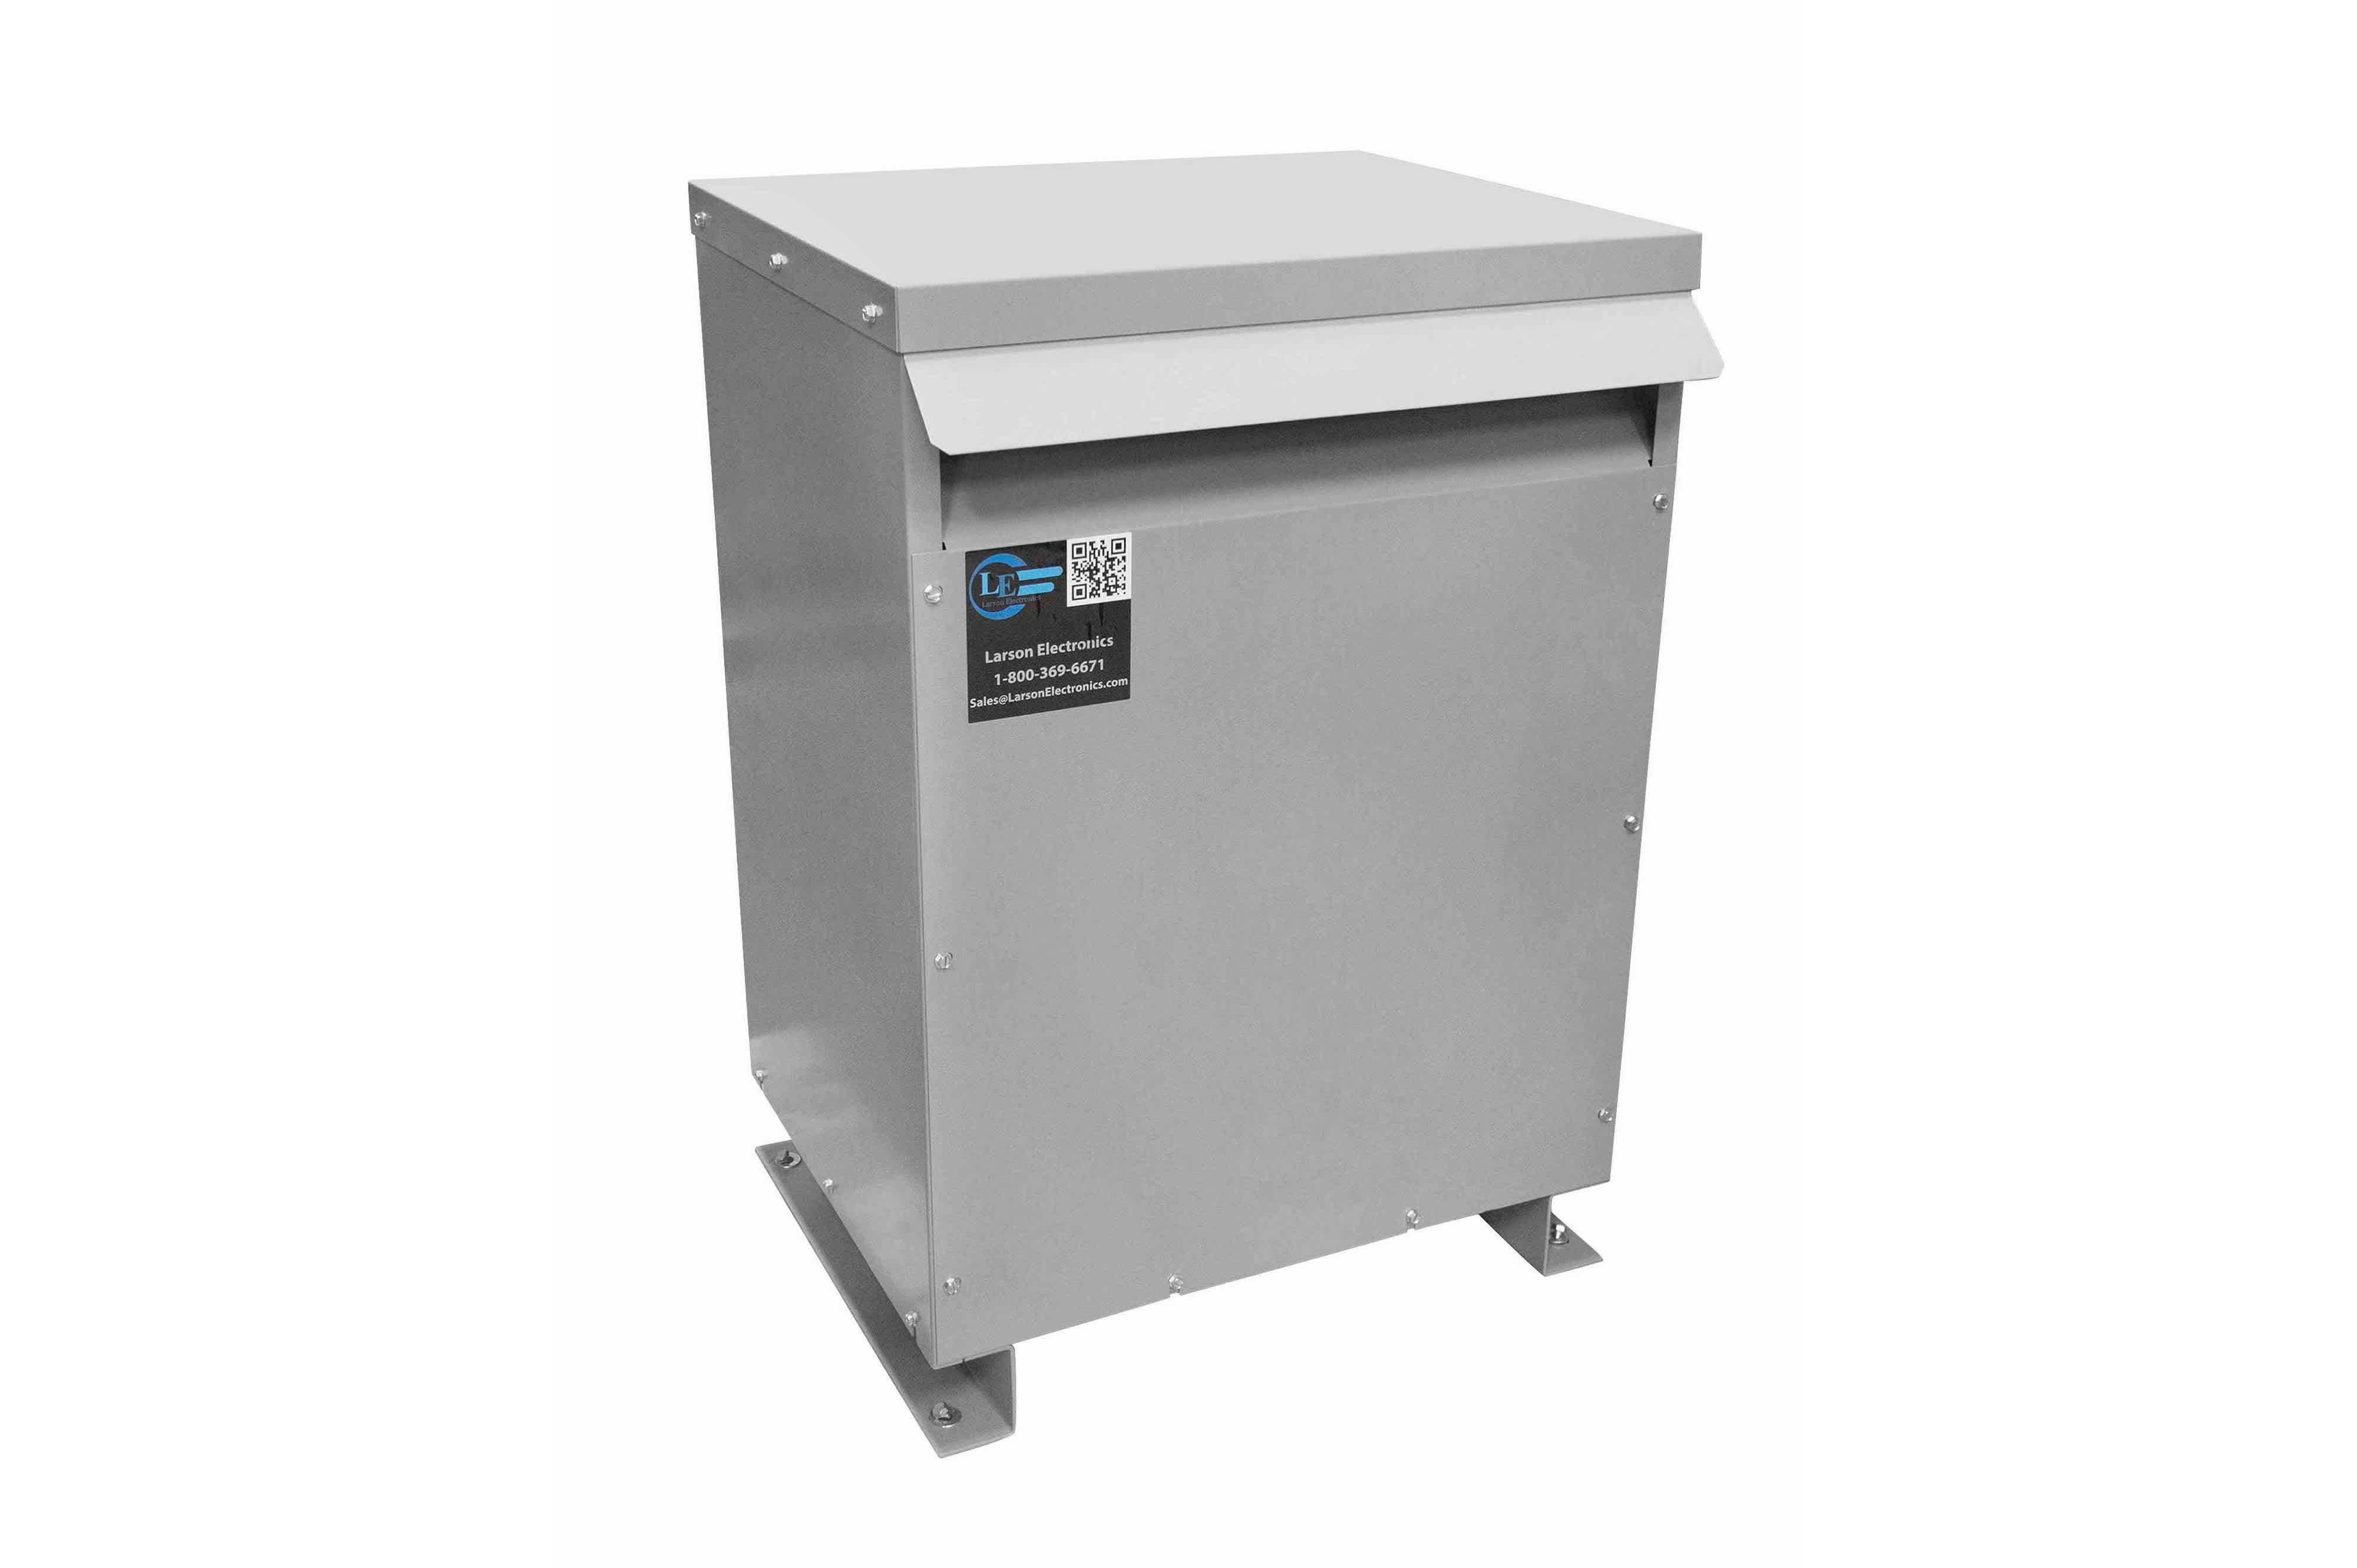 12 kVA 3PH Isolation Transformer, 600V Wye Primary, 480V Delta Secondary, N3R, Ventilated, 60 Hz